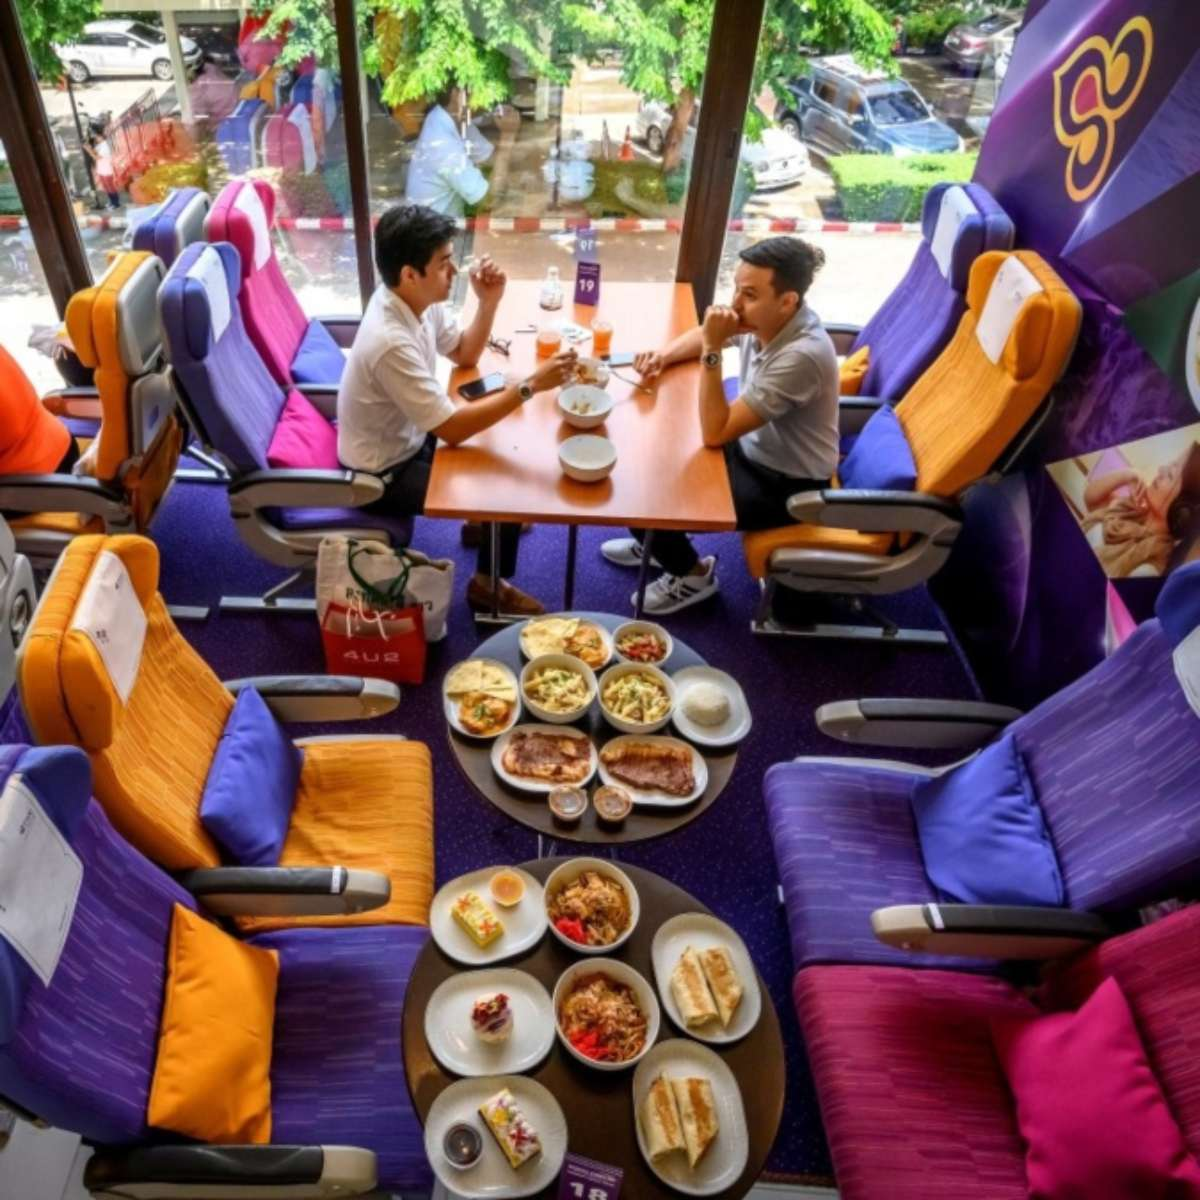 plane cafe ταϊλάνδη εσωτερικός χώρος φαγητό